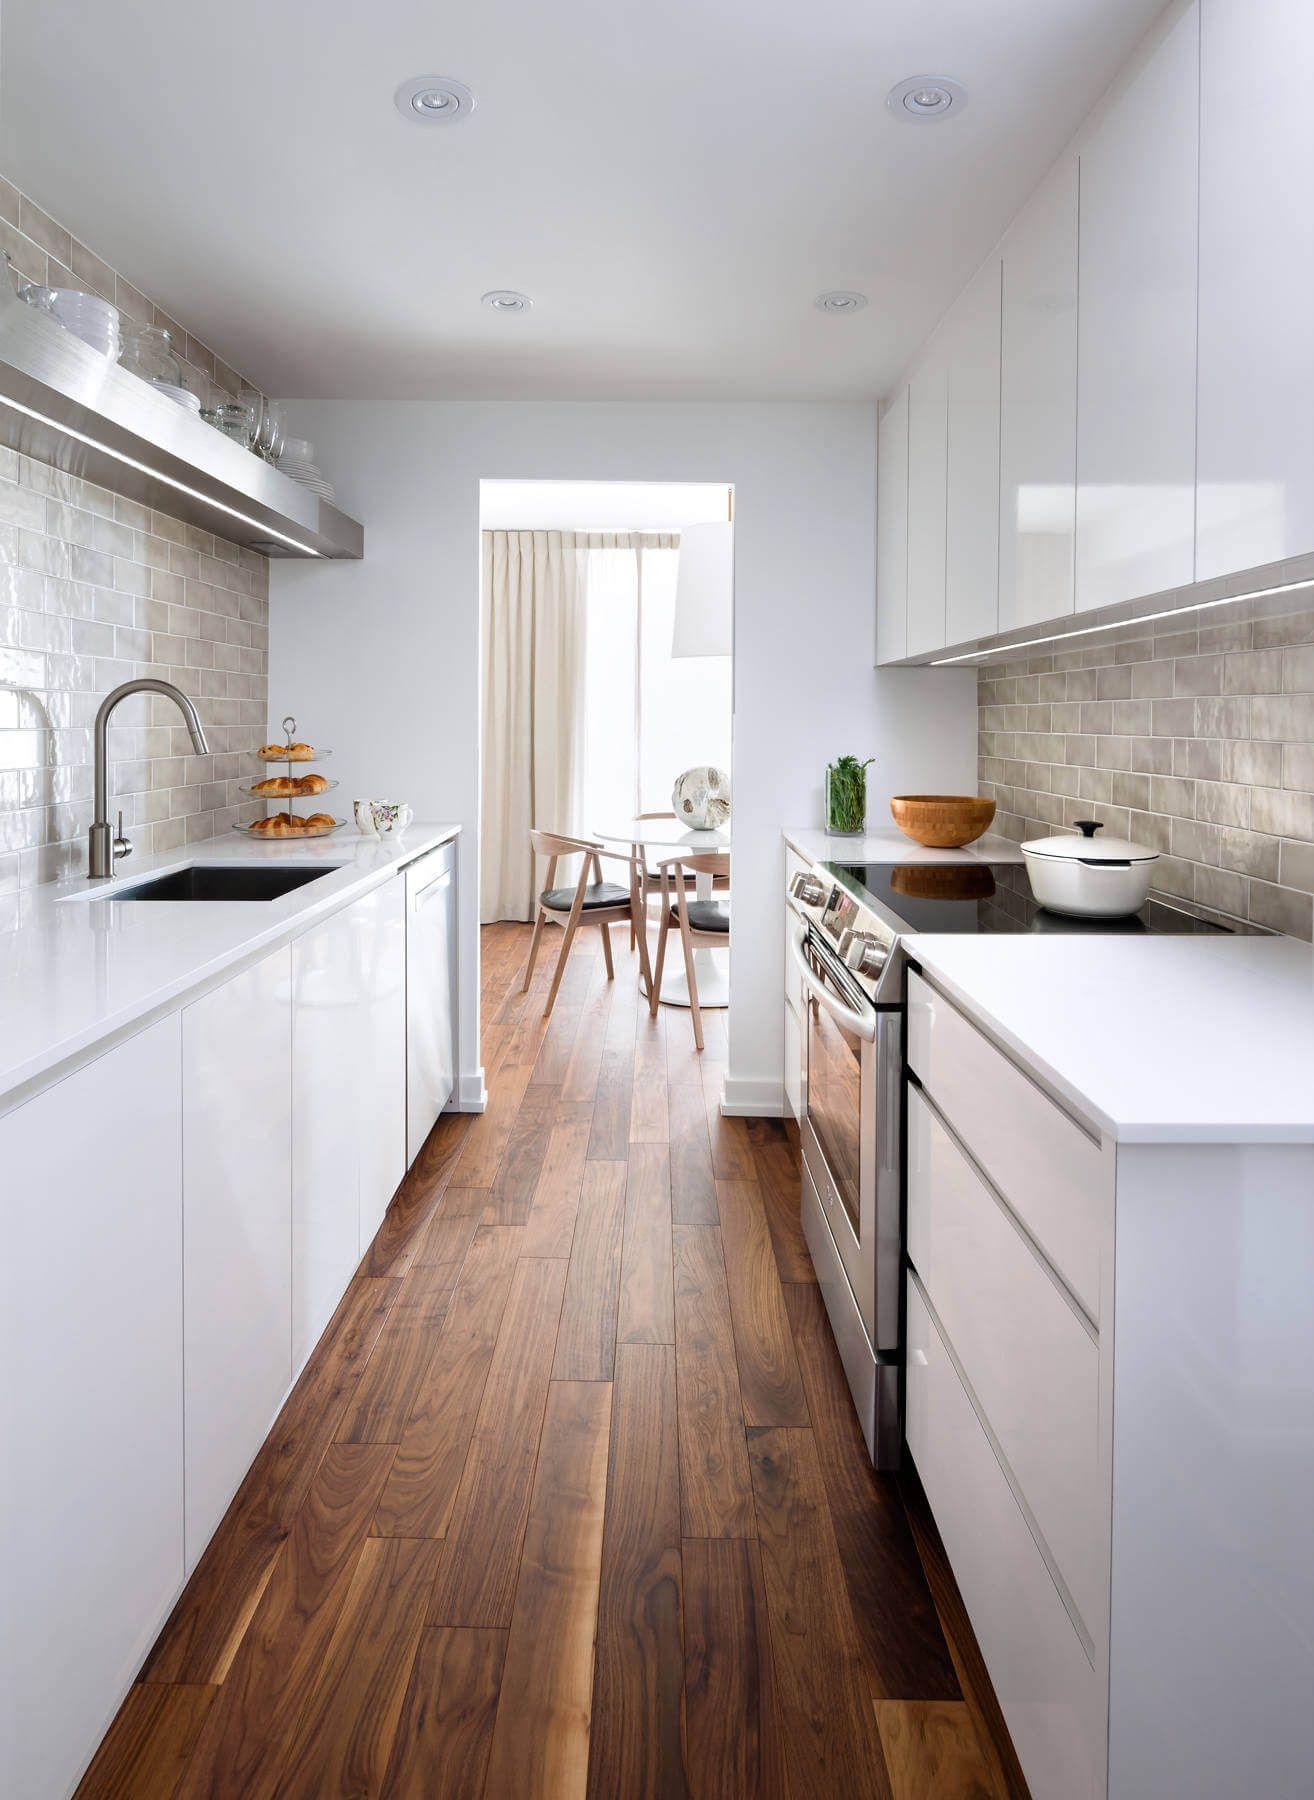 10 Narrow Kitchen Ideas 2020 (Still Trendy) in 2020